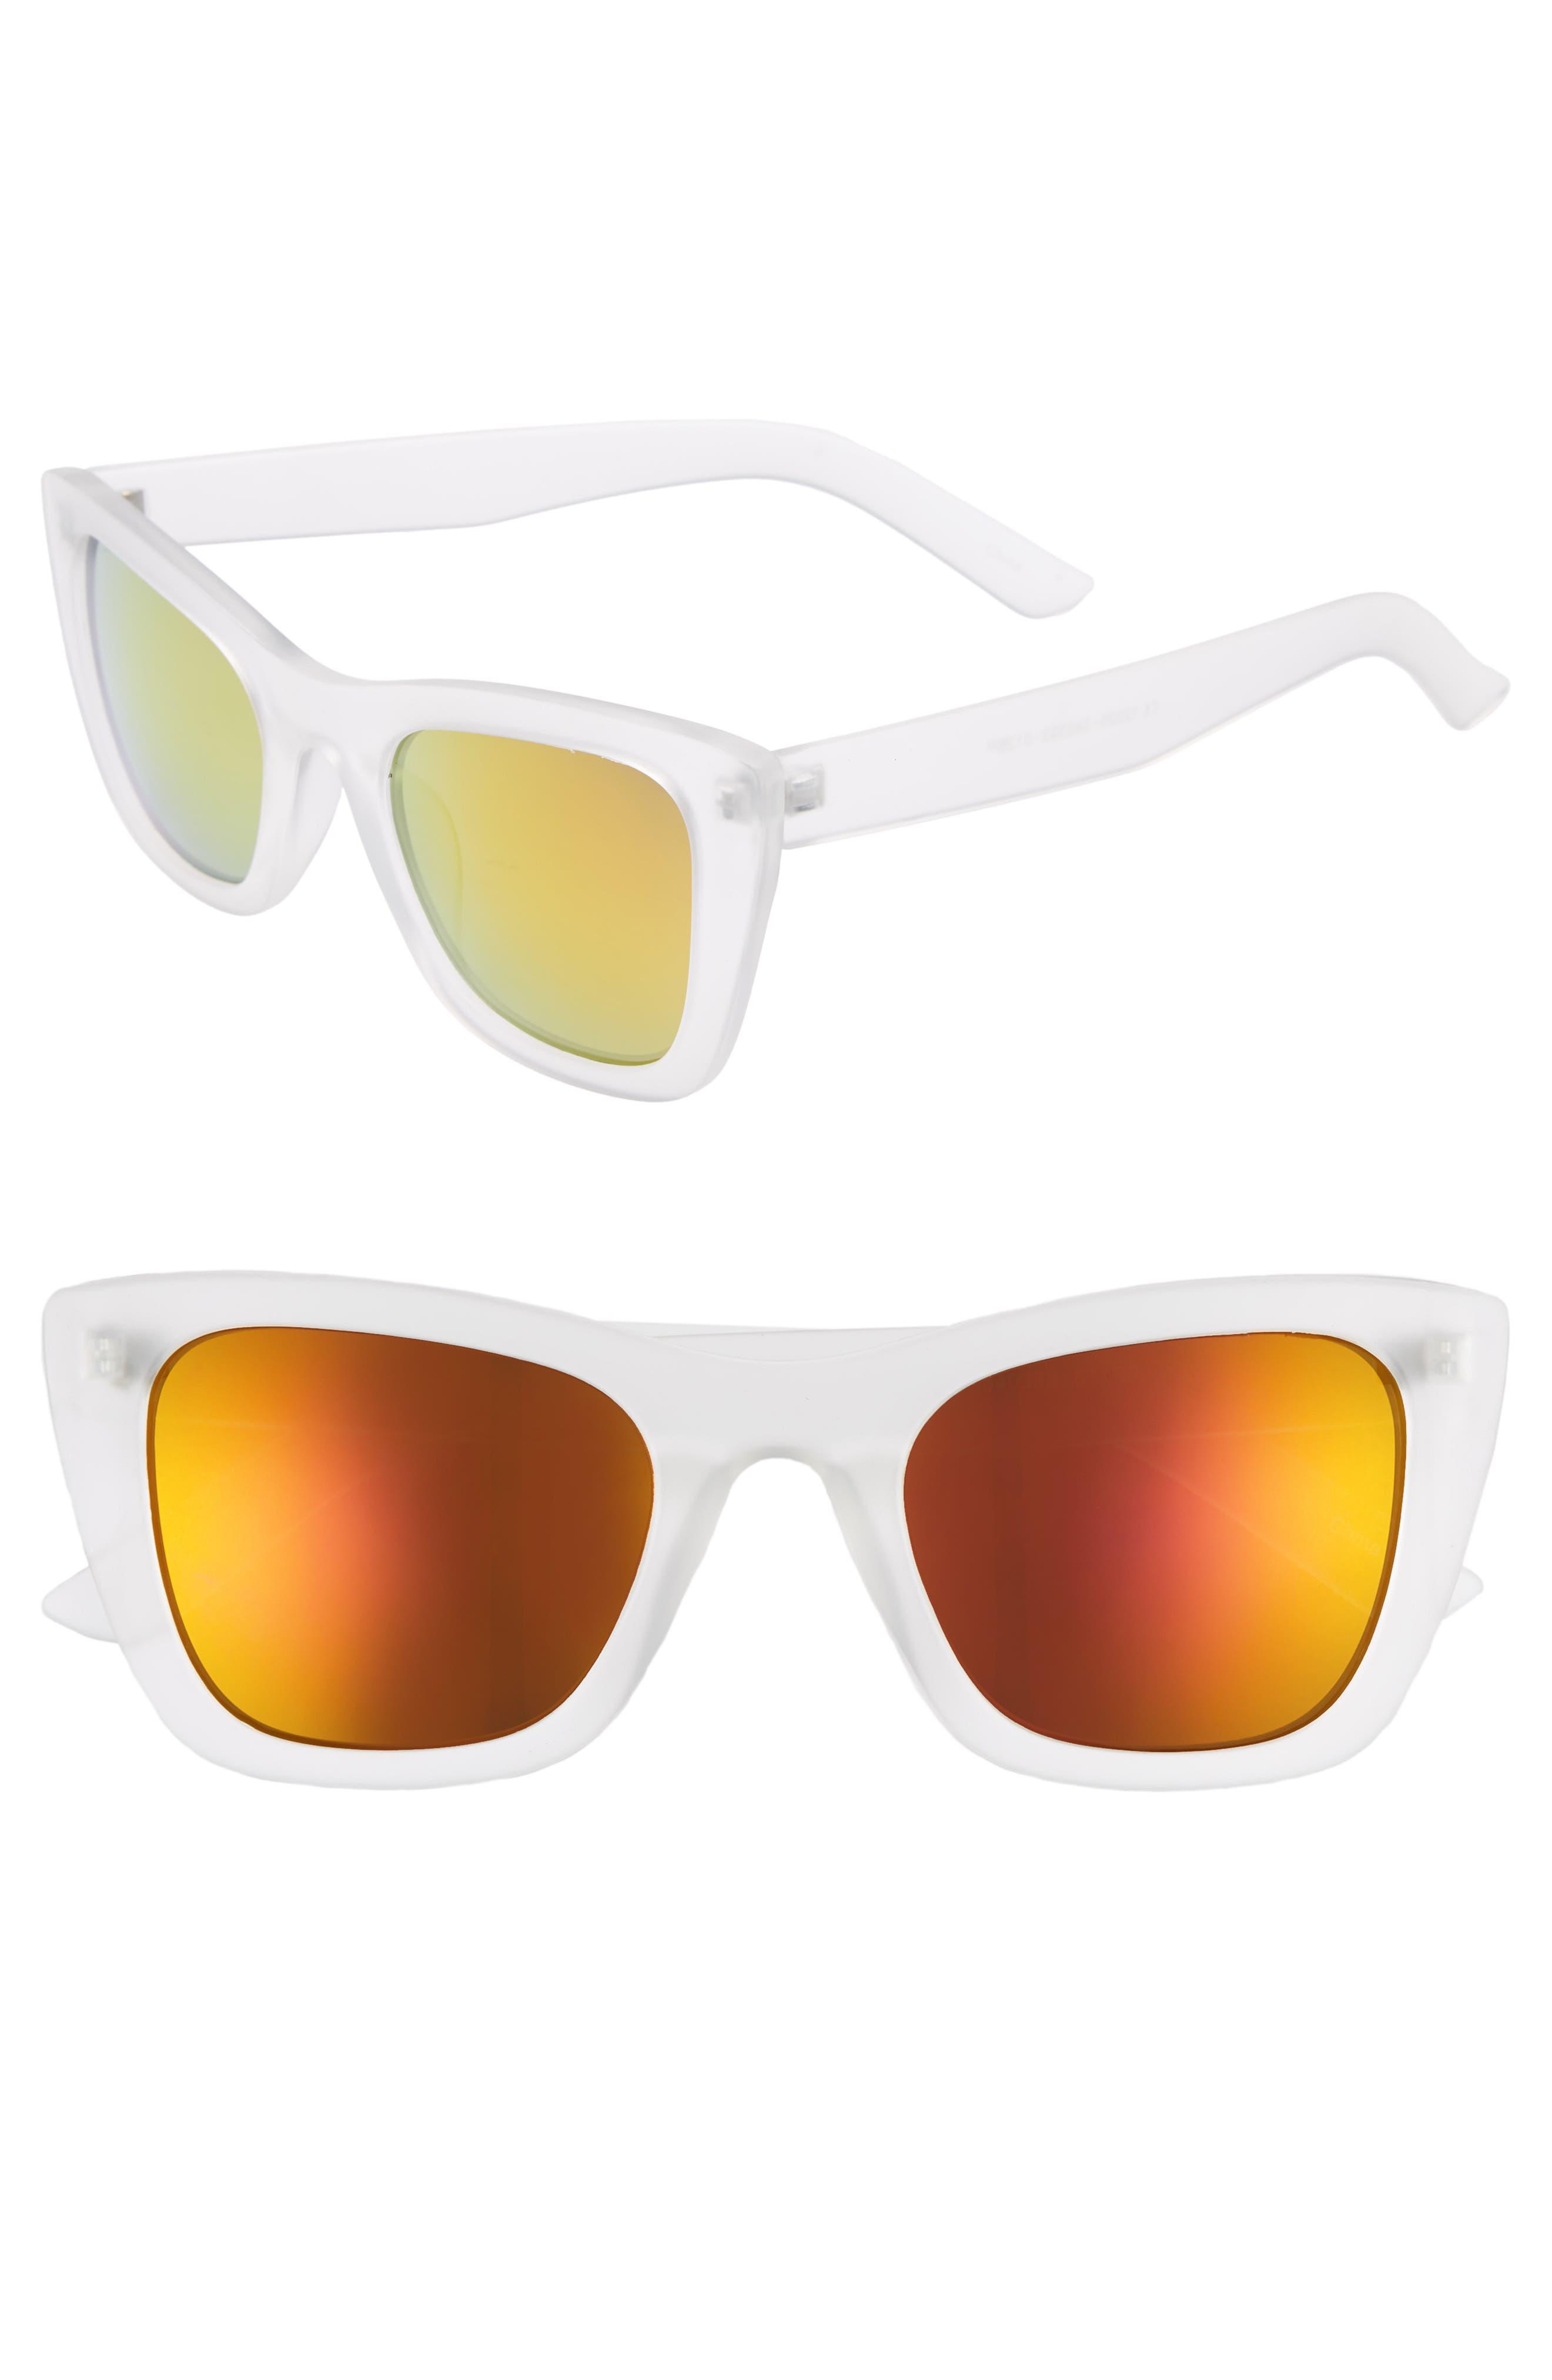 51mm Translucent Square Sunglasses,                             Main thumbnail 1, color,                             100